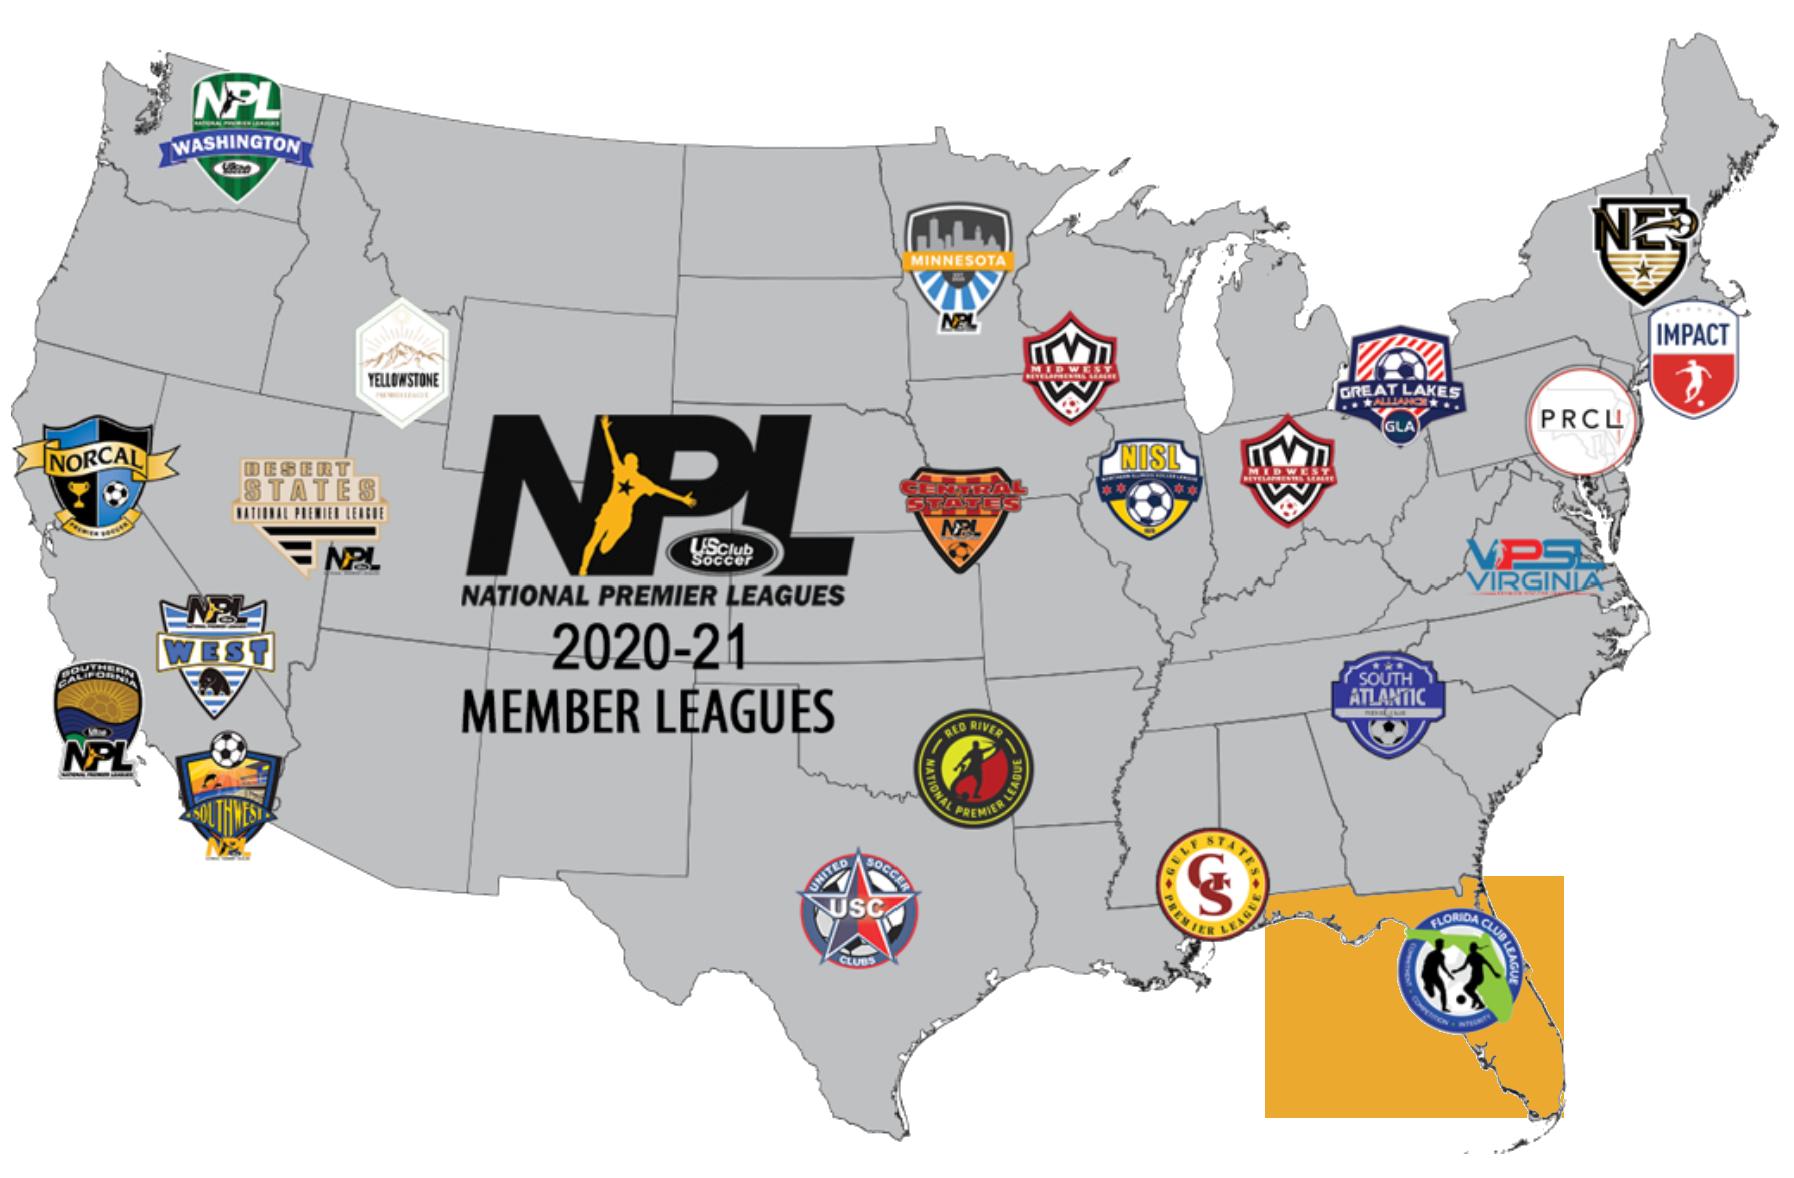 members of NPL